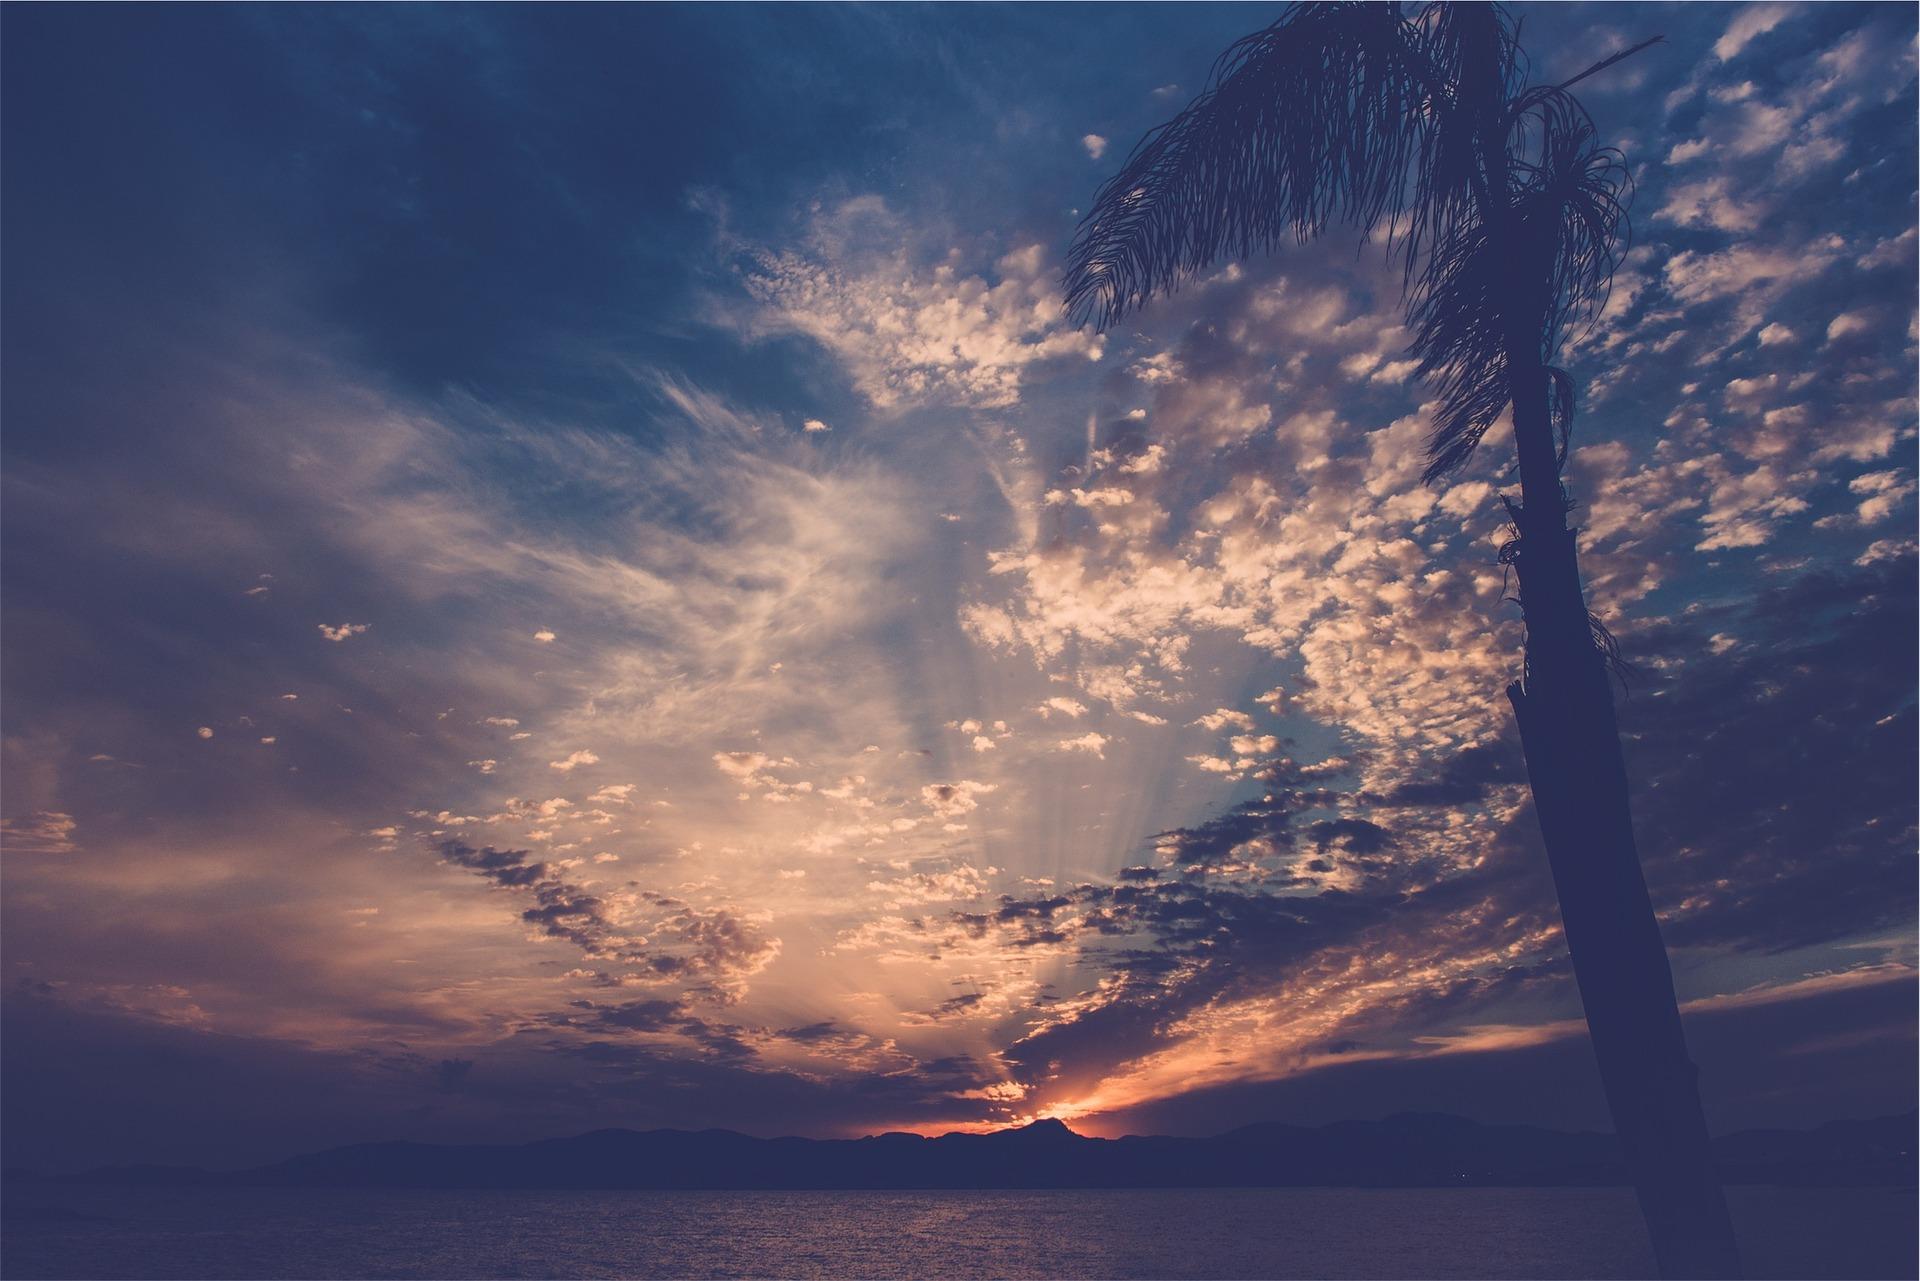 sunset-691998_1920